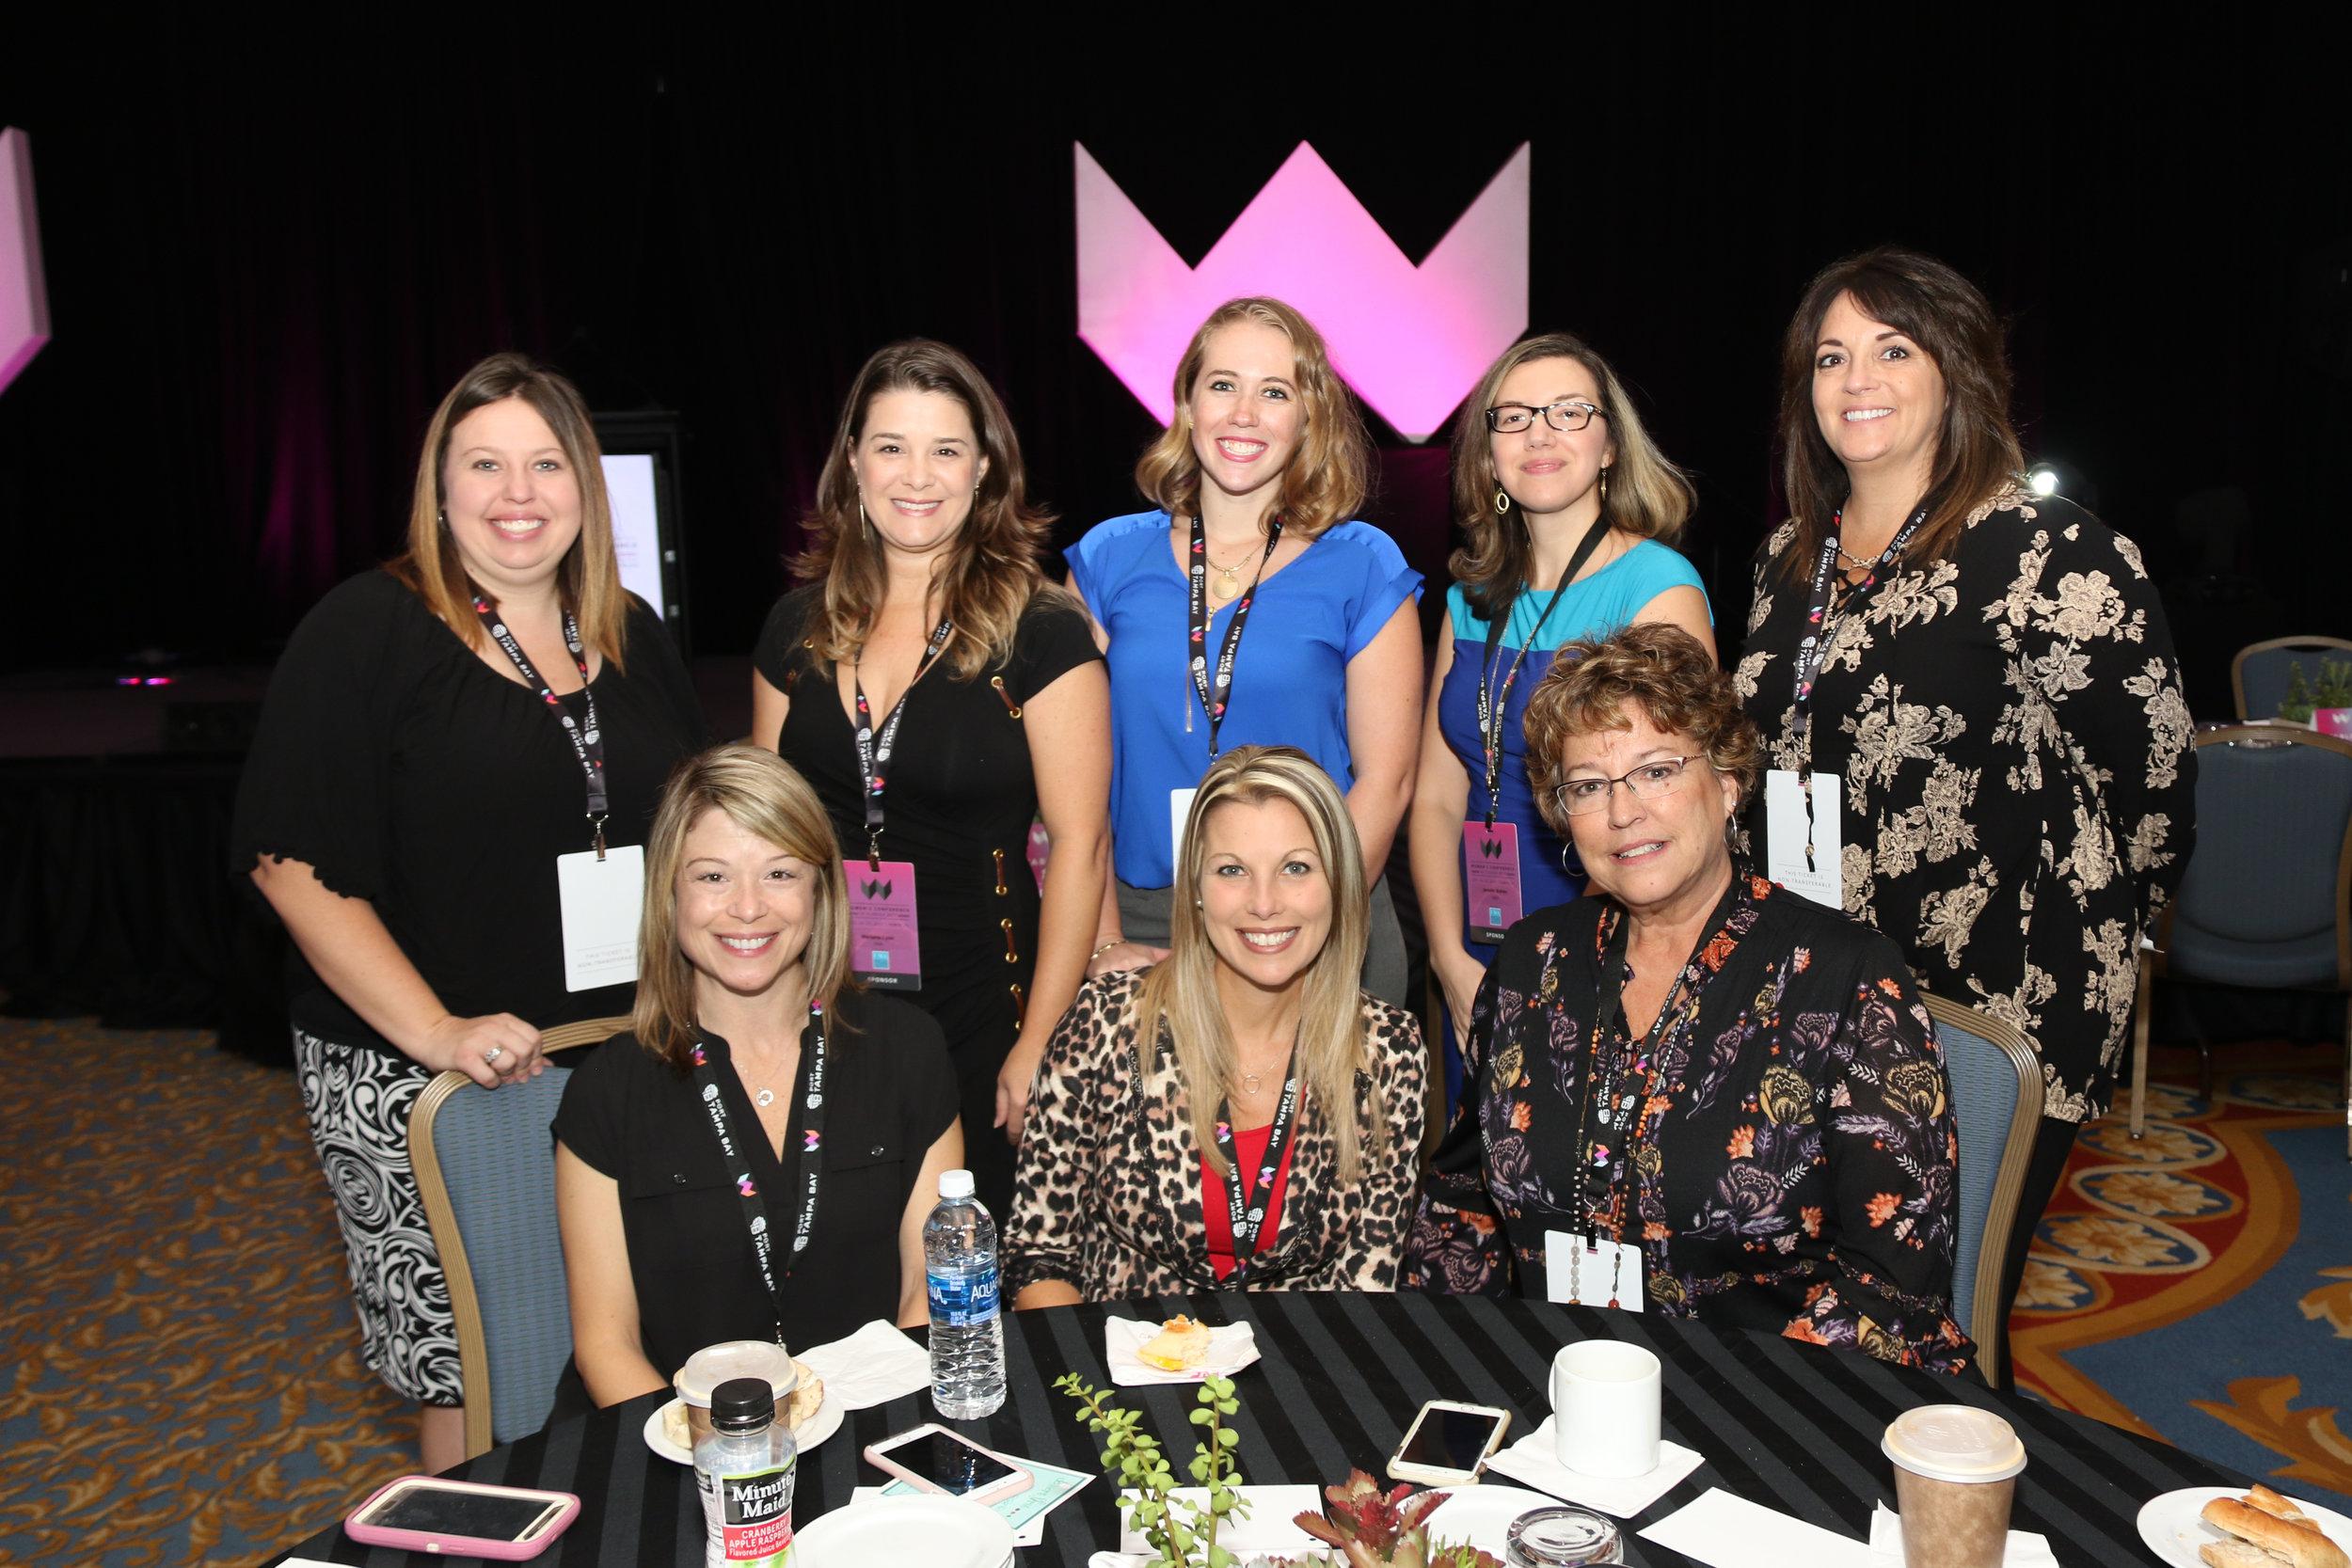 462_WomensConference_10-27-17.jpg